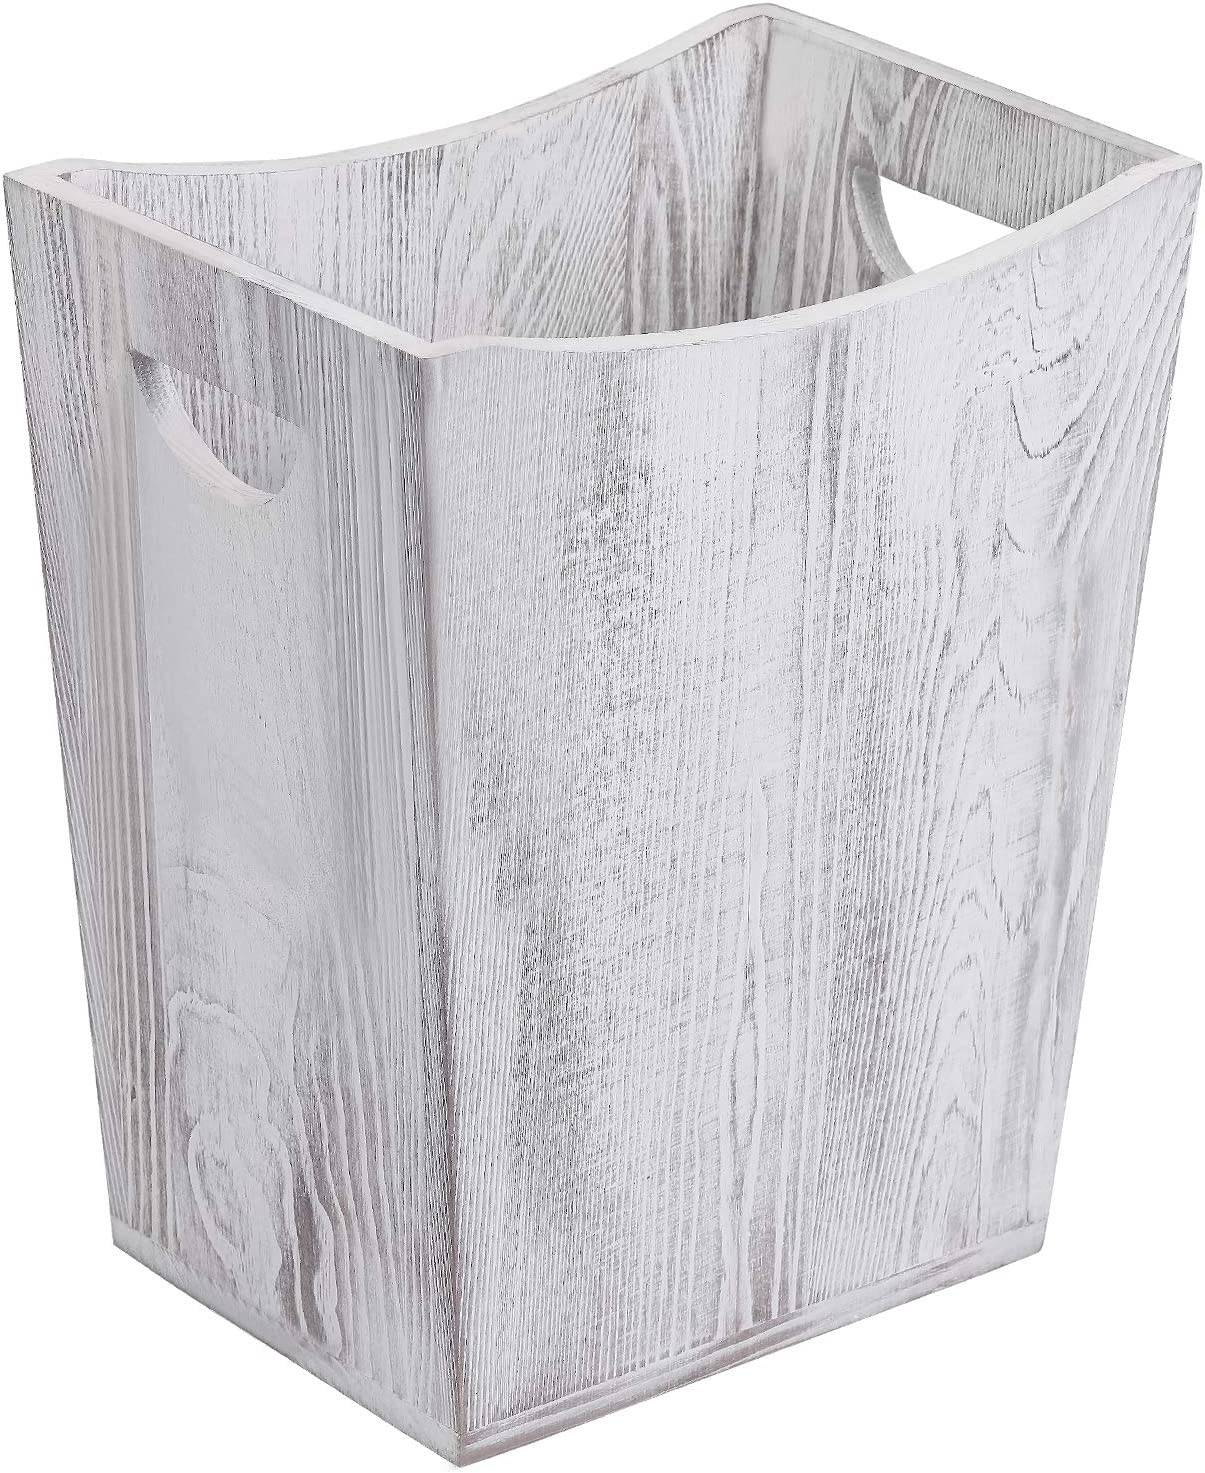 NEX Wood Trash Can, Rustic Farmhouse Style Wastebasket Bin for Bathroom, Office, Bedroom, Living Room